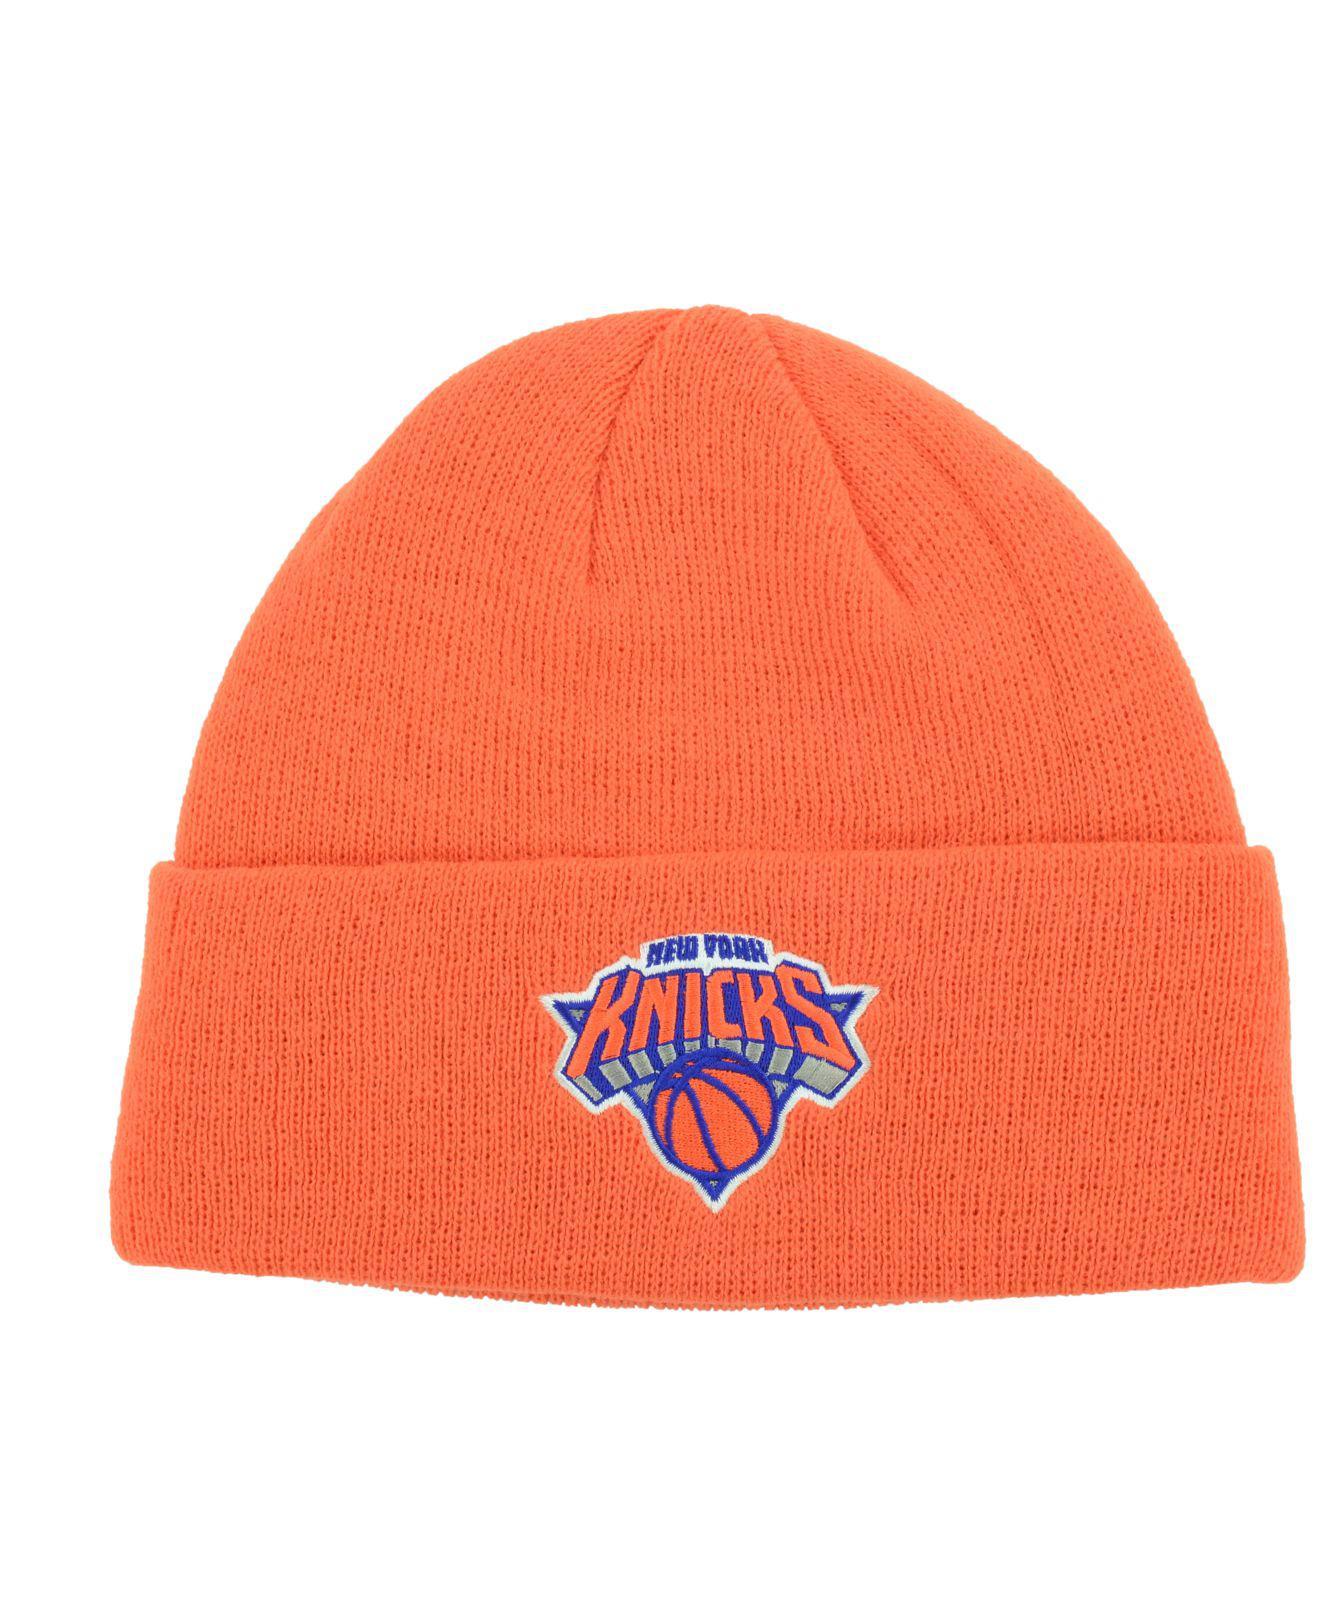 50144c15fbc5ce Lyst - adidas New York Knicks Cuff Knit Hat in Orange for Men